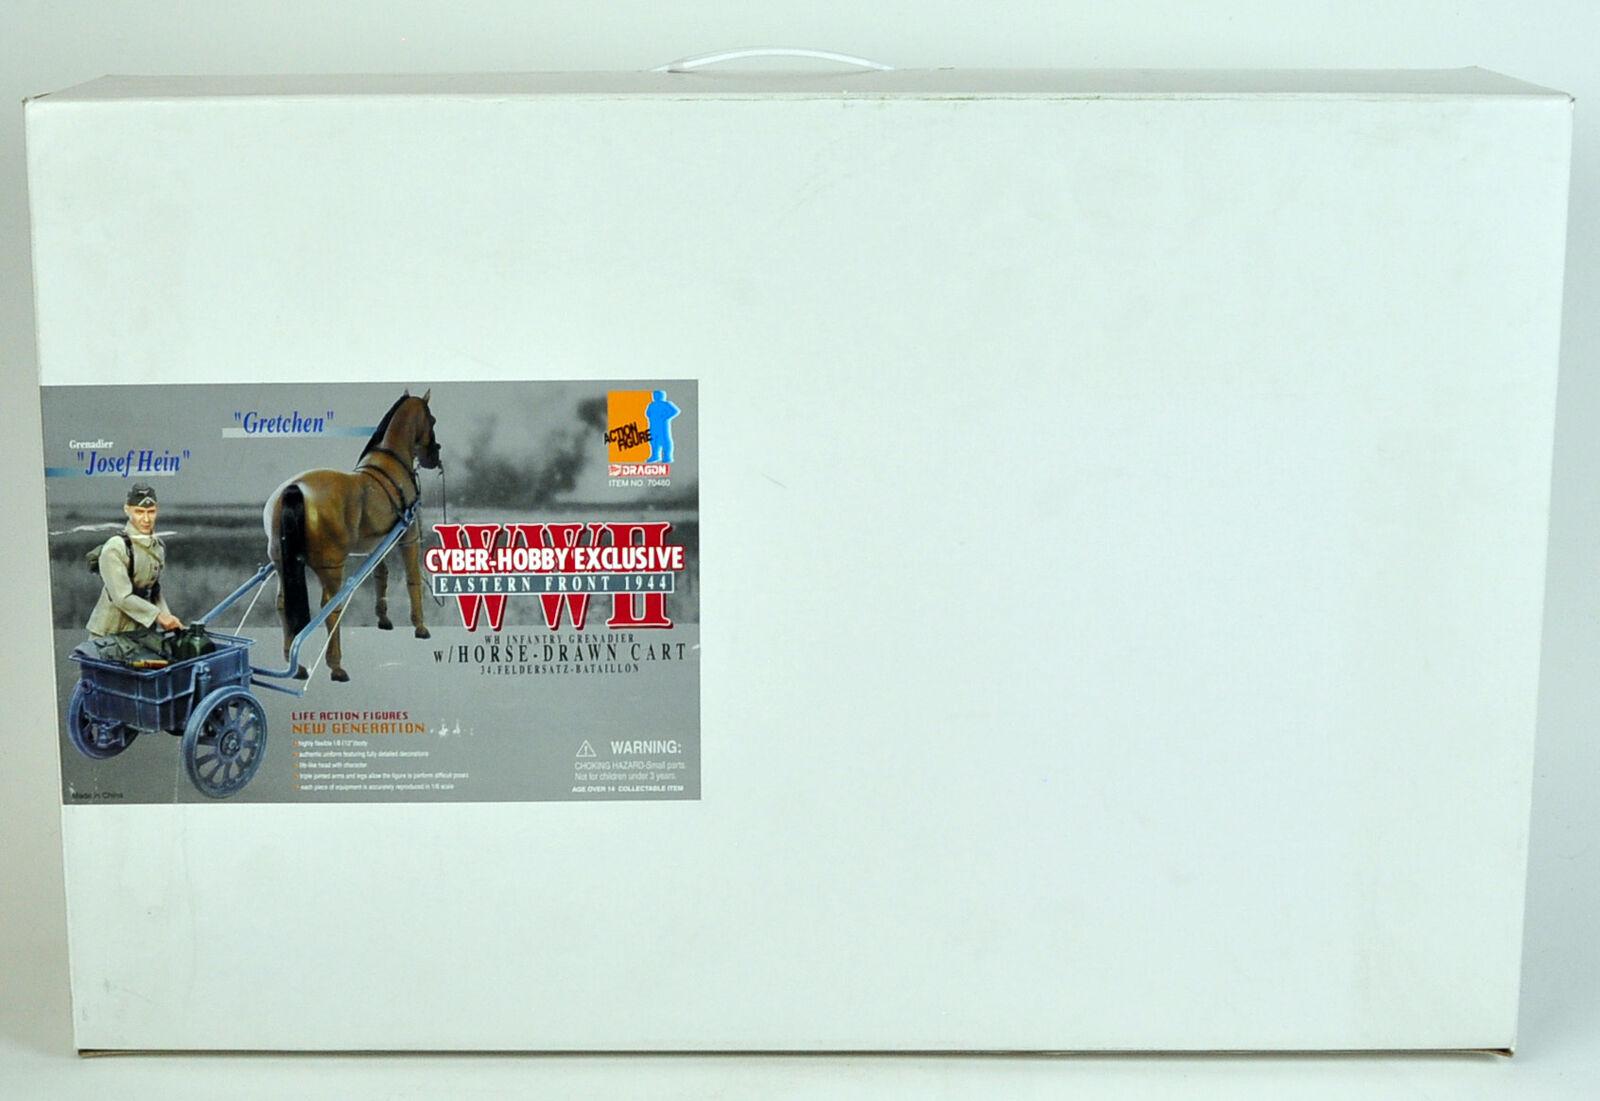 Cyber Hobby exclusivas de Dragon Segunda Guerra Mundial Alemania Granadero W caballo Dibujado Cochero 70480 1943